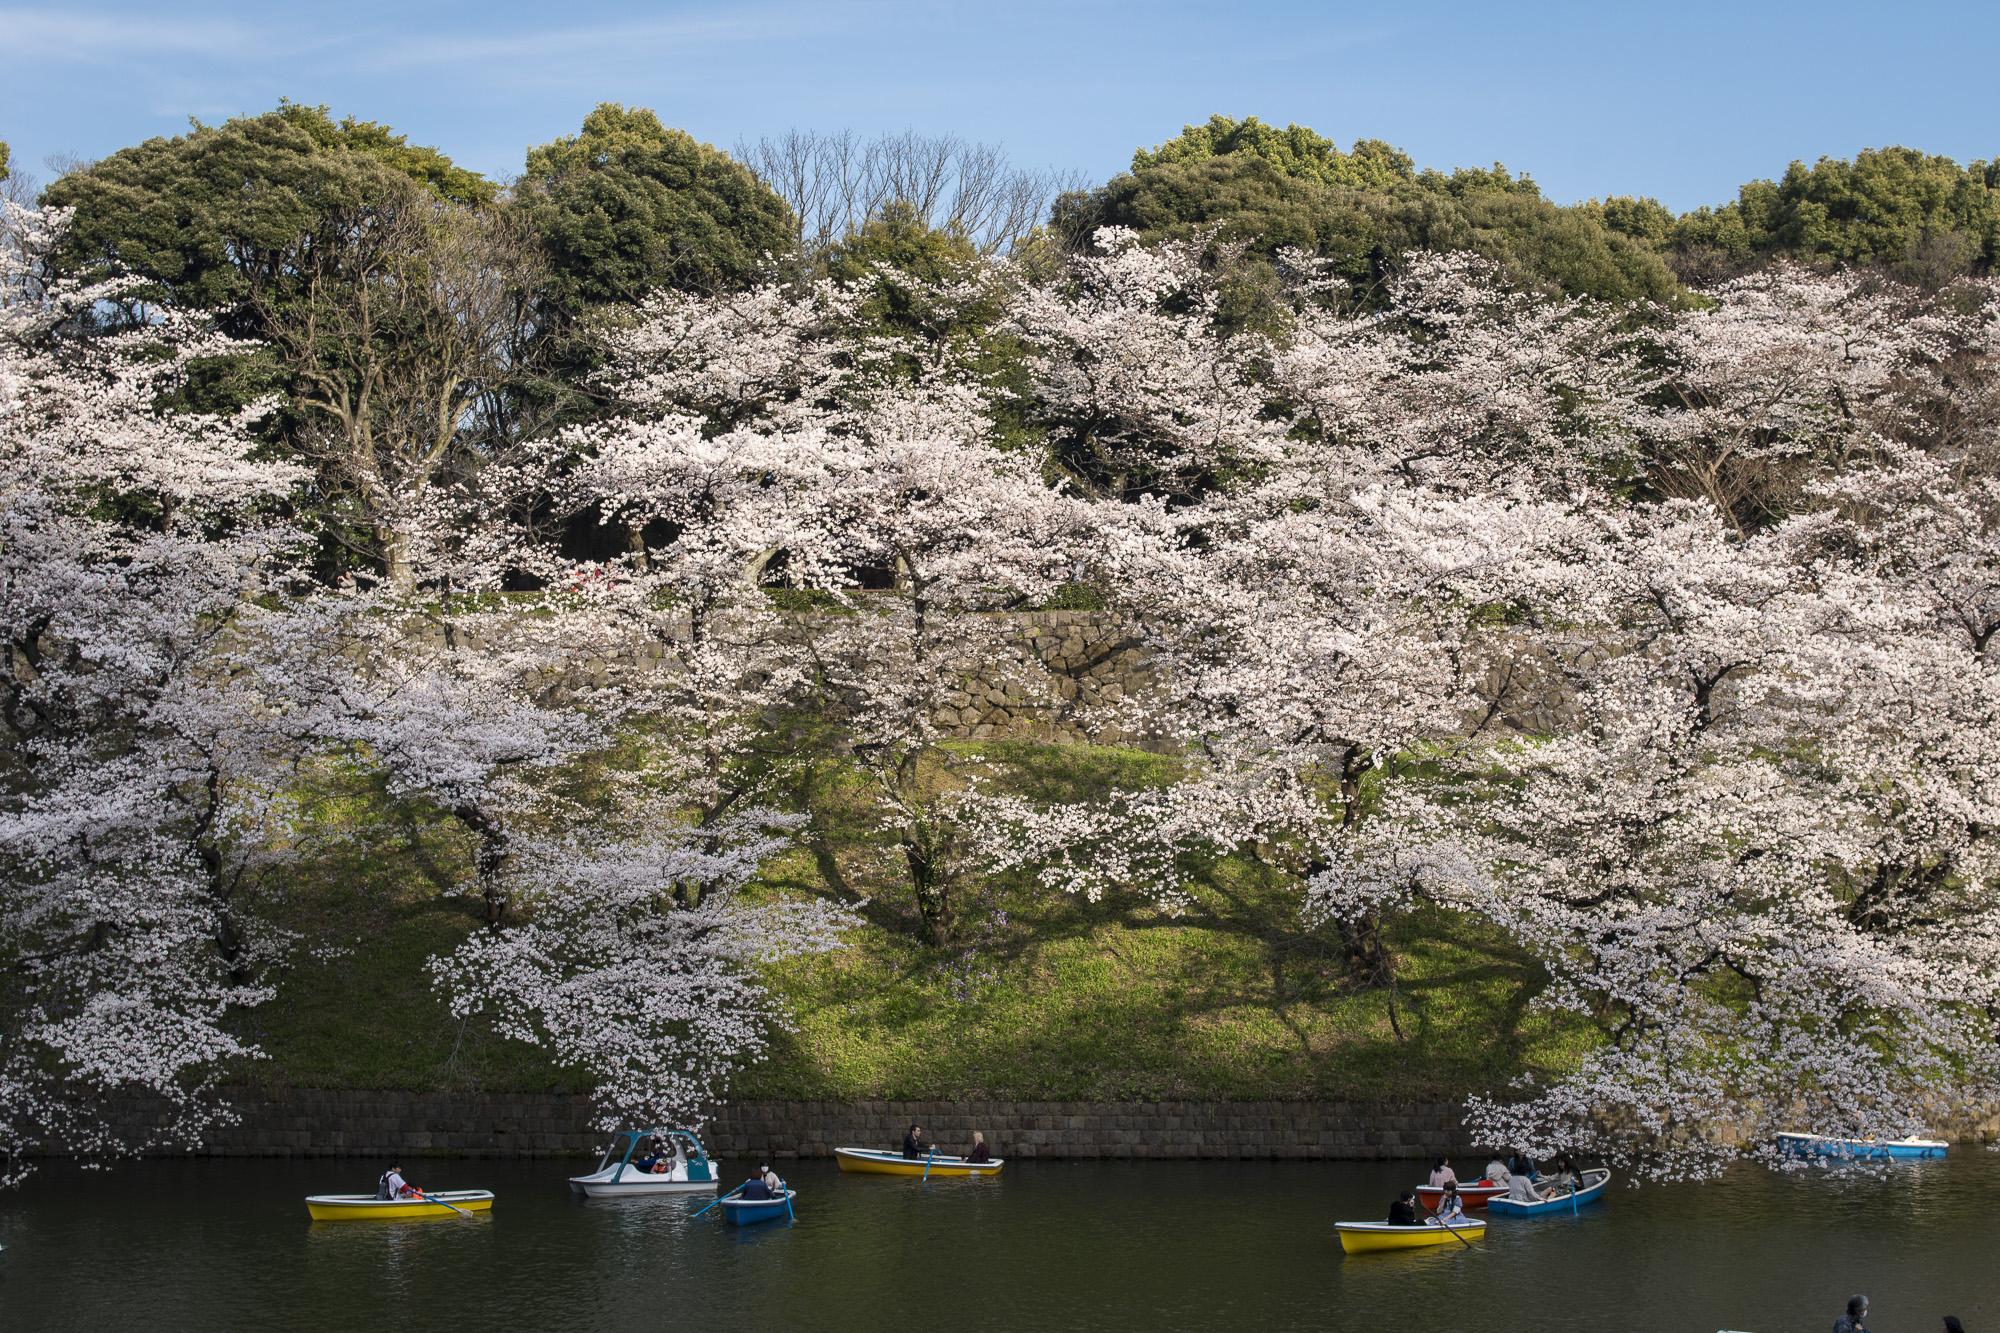 Chidori-ga-fuchi, Tokyo  PHOTOGRAPHY: Alexander J.E. Bradley • NIKON D500 • AF-S NIKKOR 24-70MM ƒ/2.8G ED @ 32MM • ƒ/8 • 1/125 • ISO 100